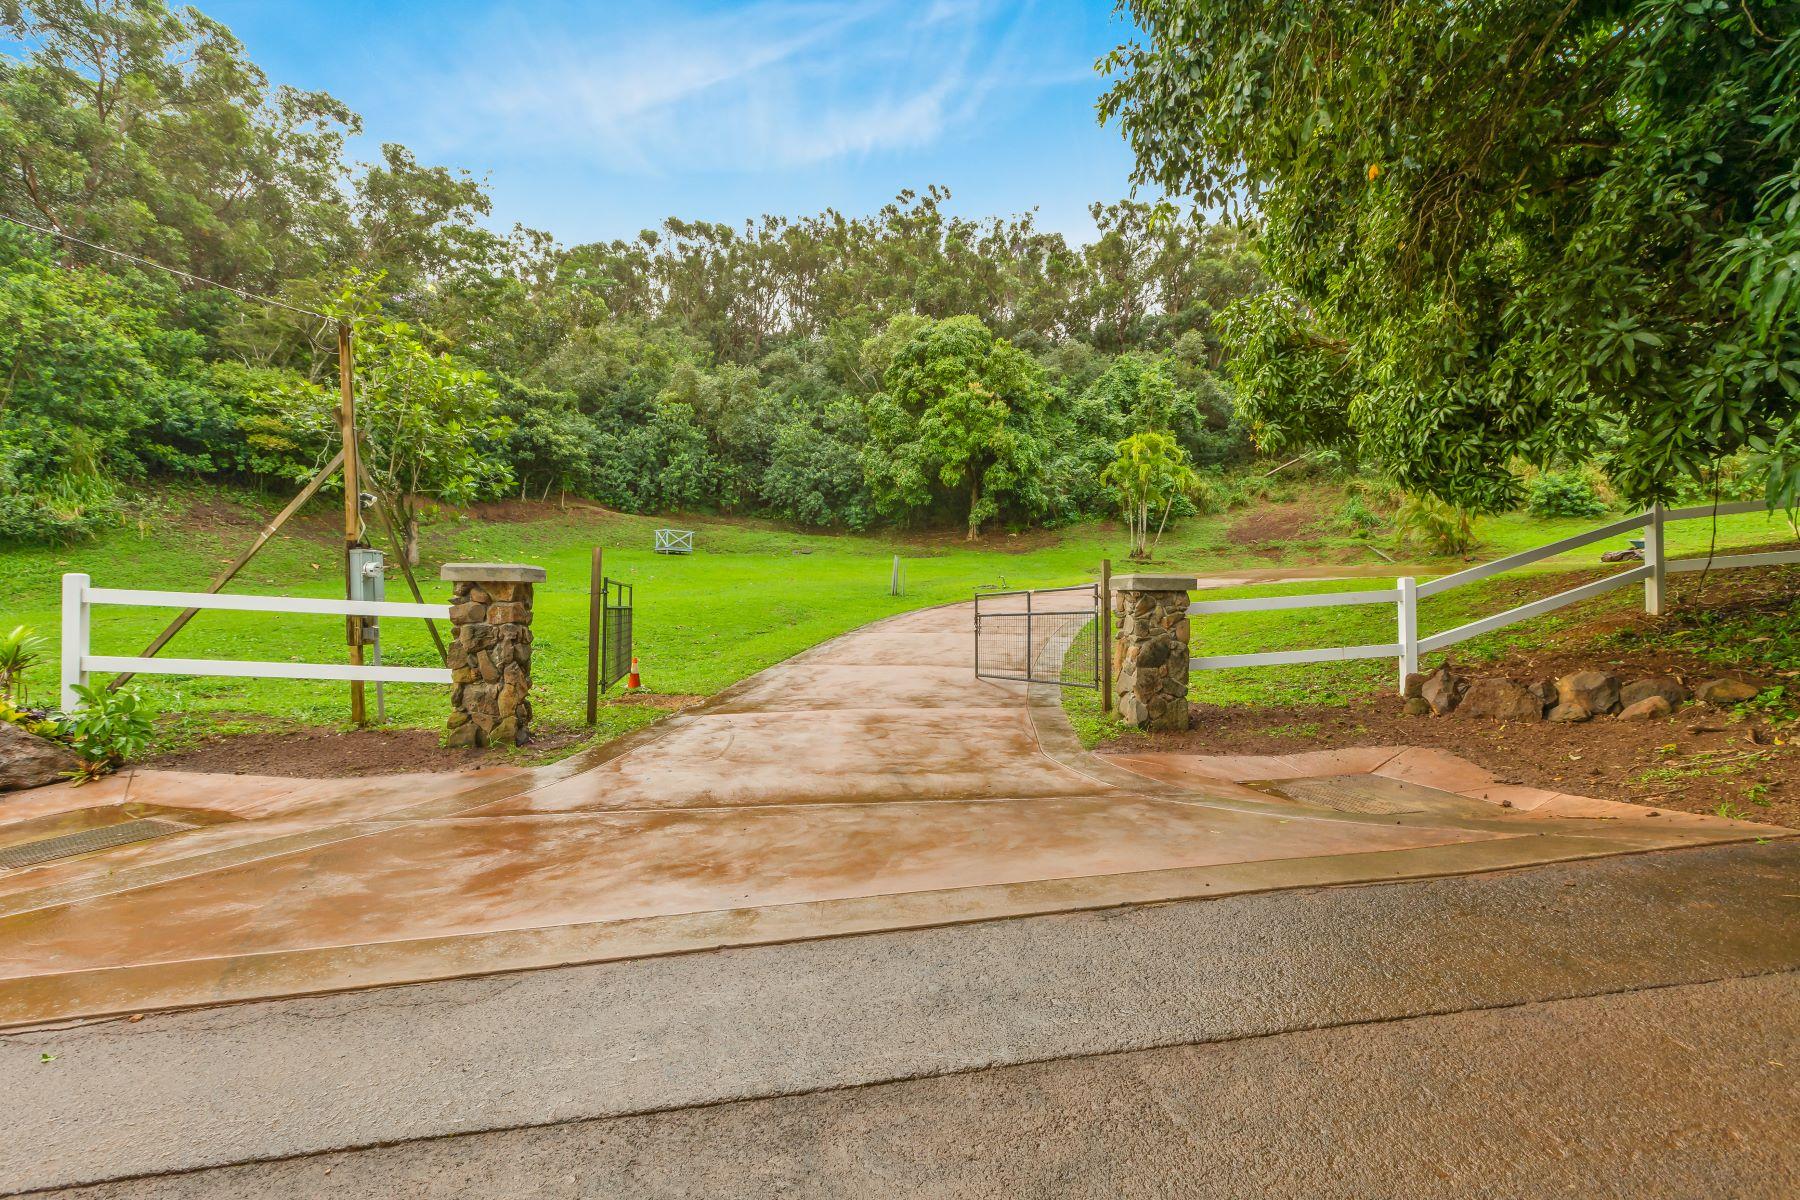 Land for Sale at 4288 UMIUMI RD KALAHEO, HI 96741 4288 UMIUMI RD Kalaheo, Hawaii 96741 United States